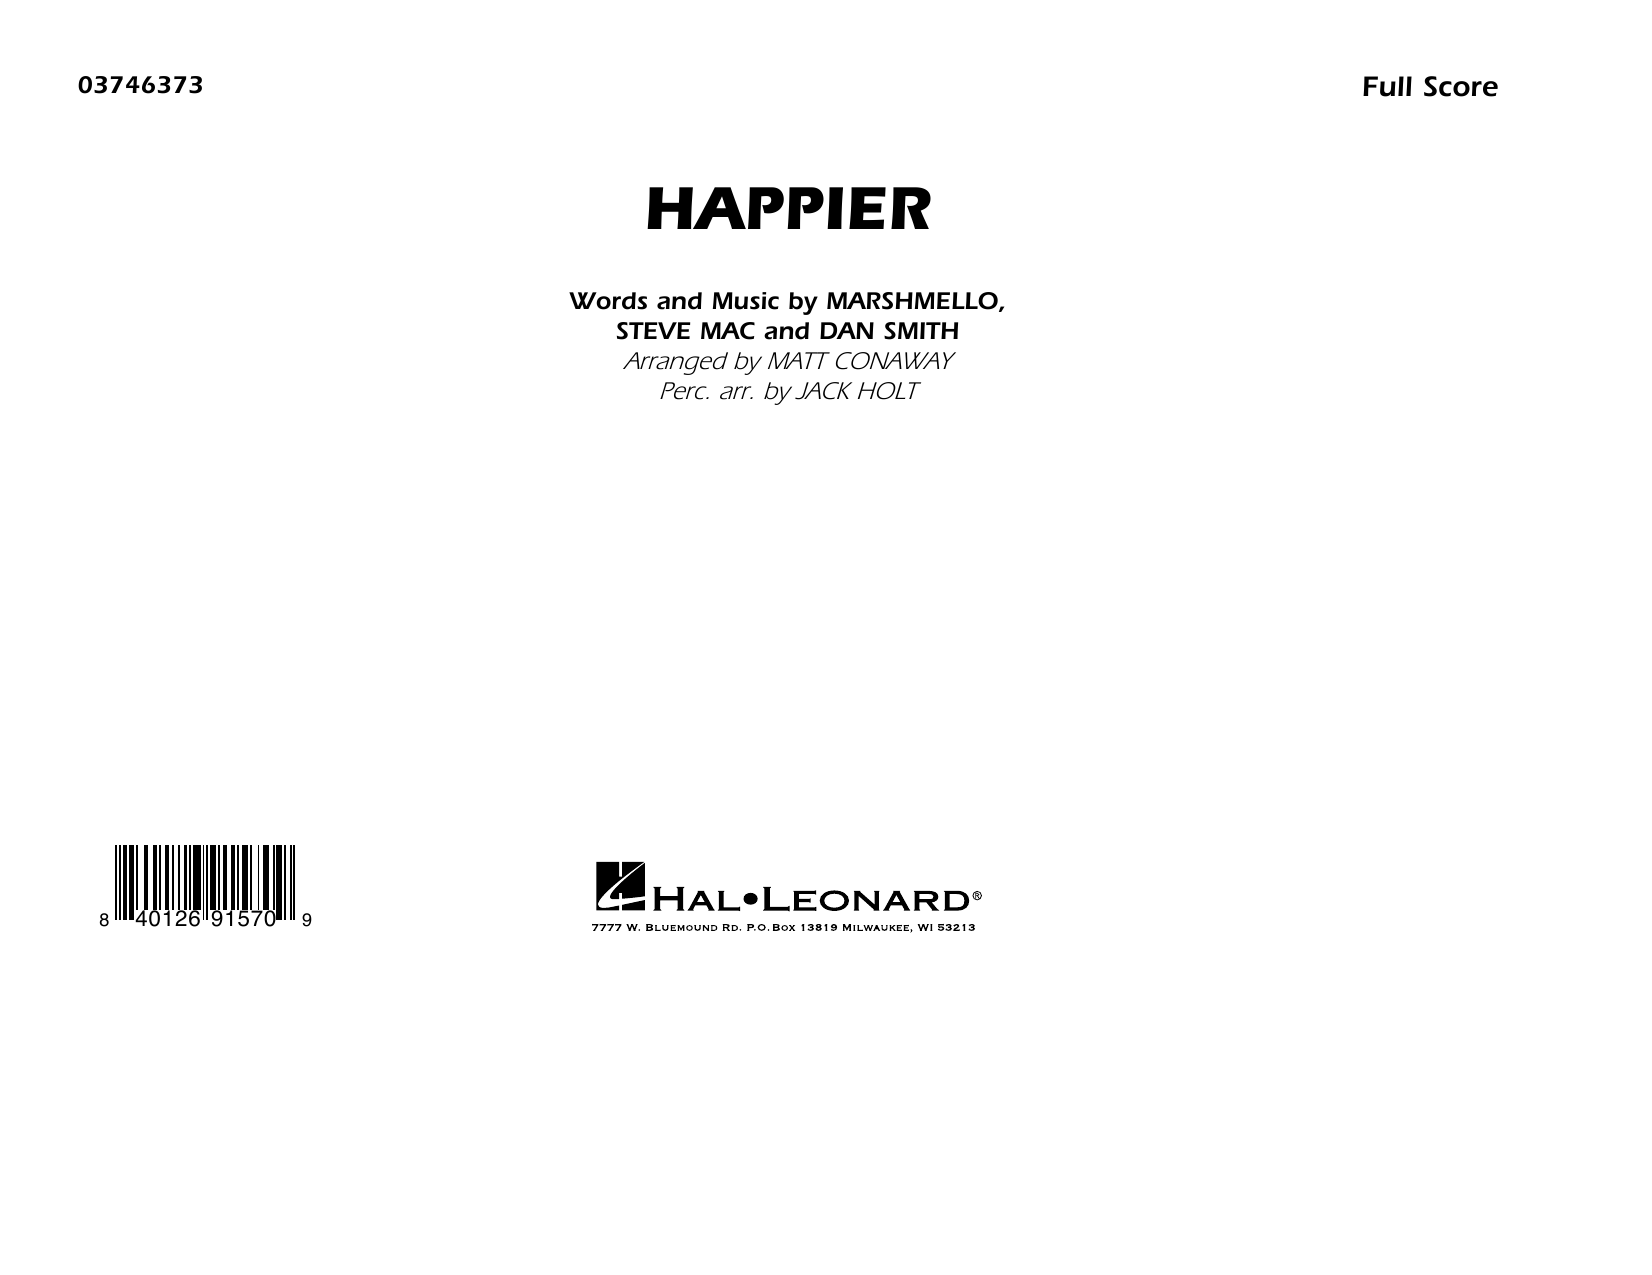 Happier (arr. Matt Conaway and Jack Holt) - Conductor Score (Full Score) Sheet Music